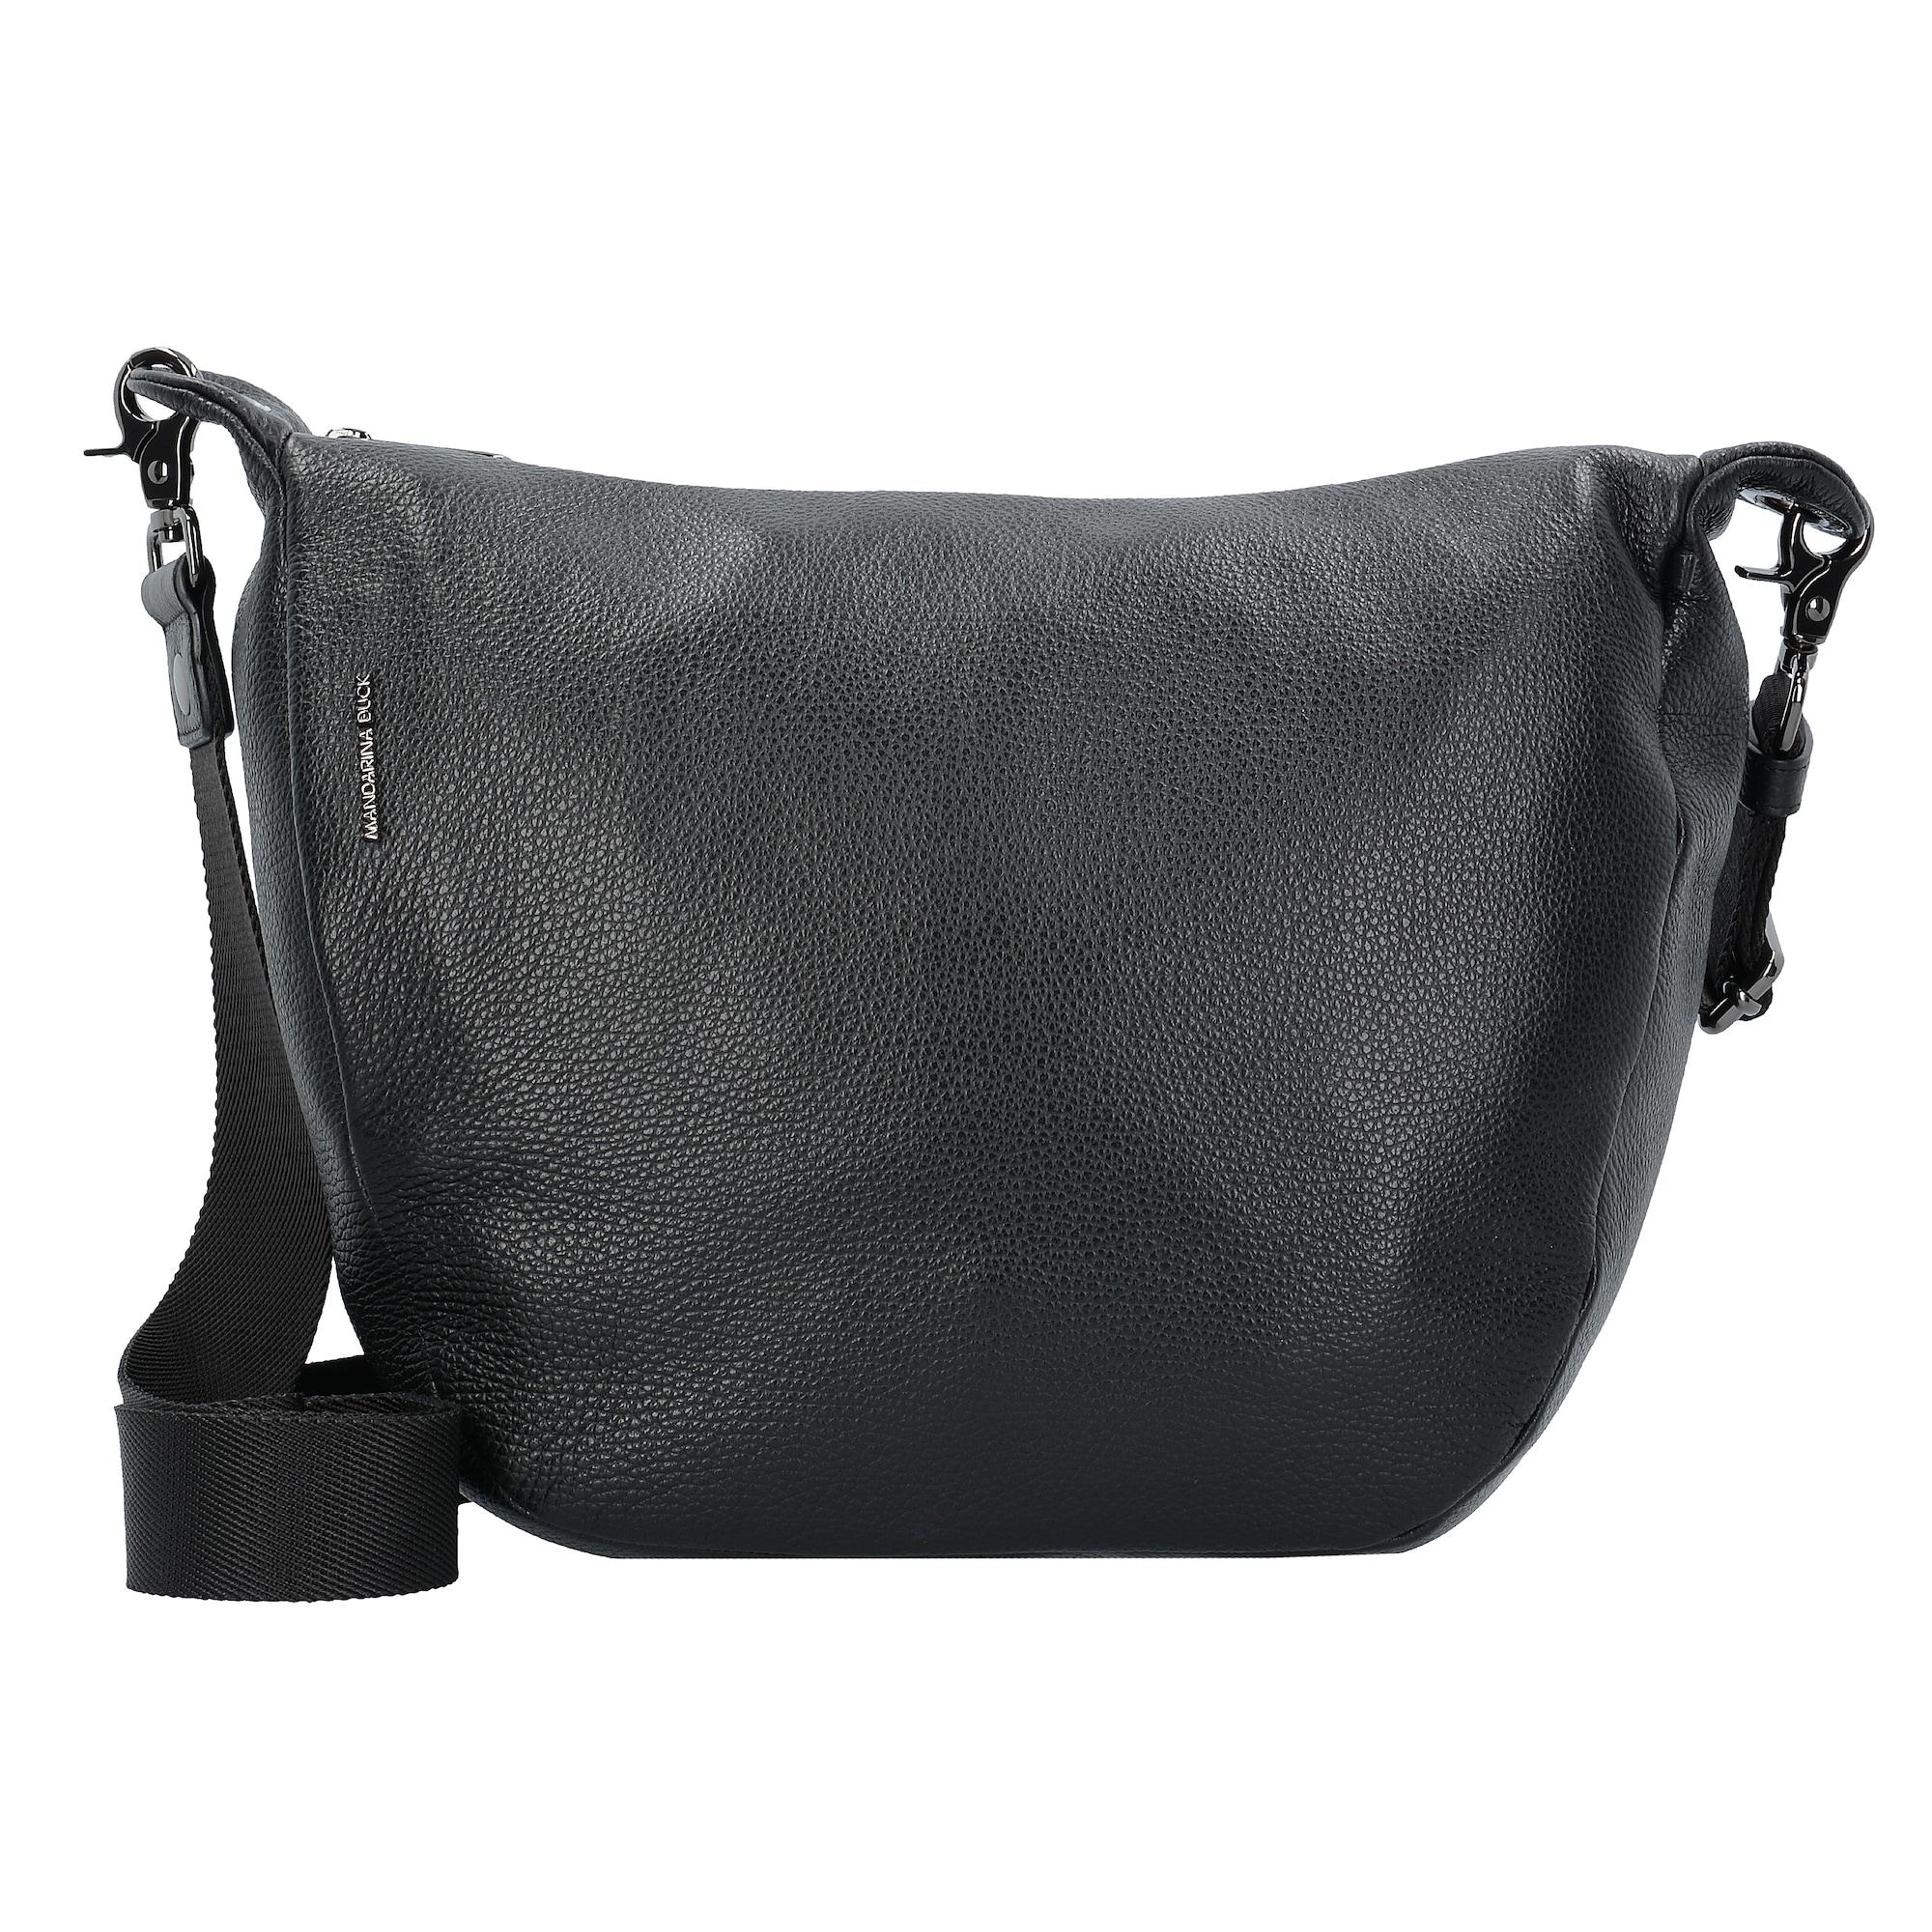 Umhängetasche 'Mellow' | Taschen > Handtaschen > Umhängetaschen | Mandarina Duck